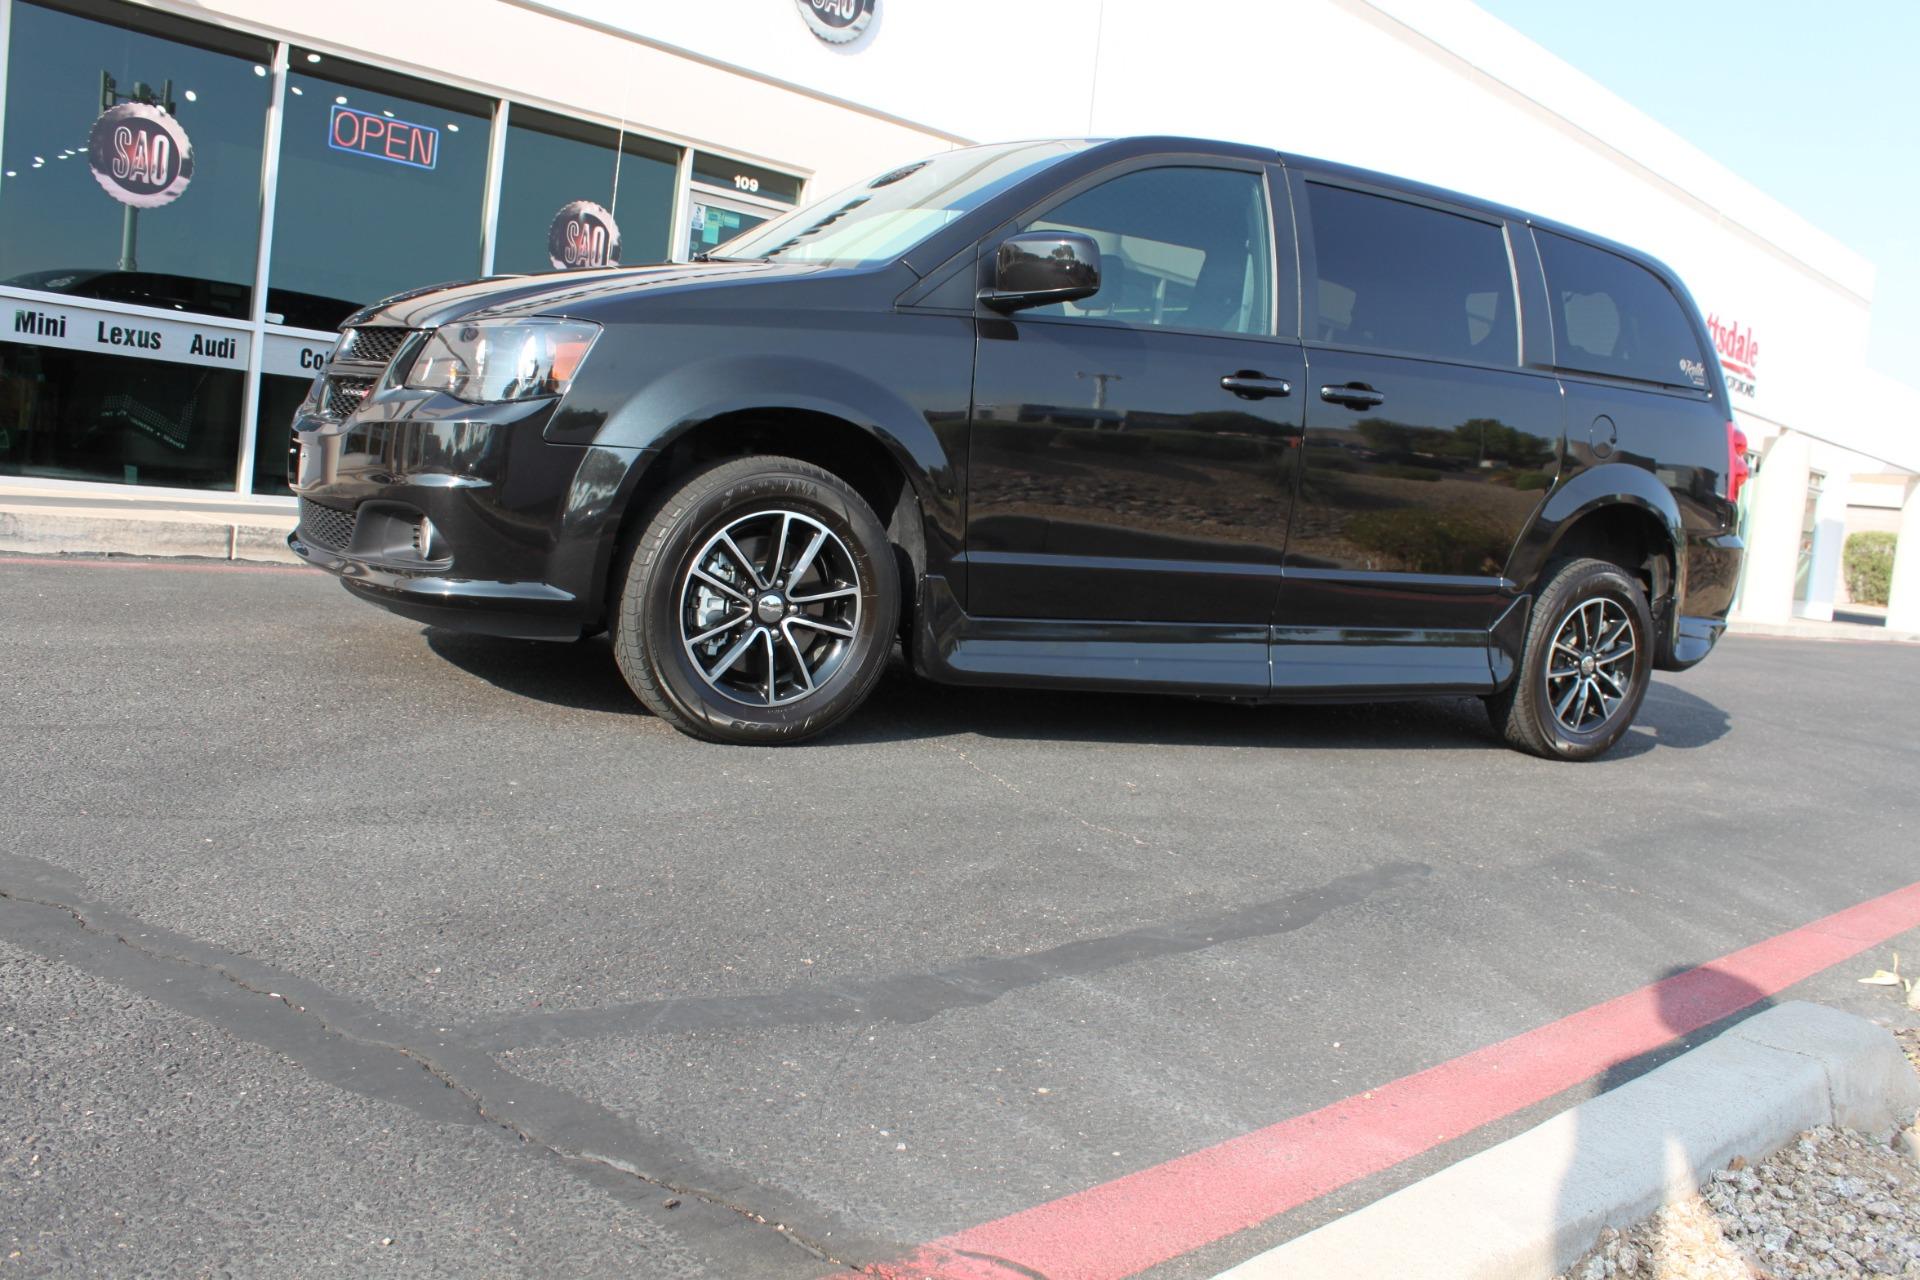 Used-2018-Dodge-Grand-Caravan-SXT-Rollx-Mobility-Conversion-Audi